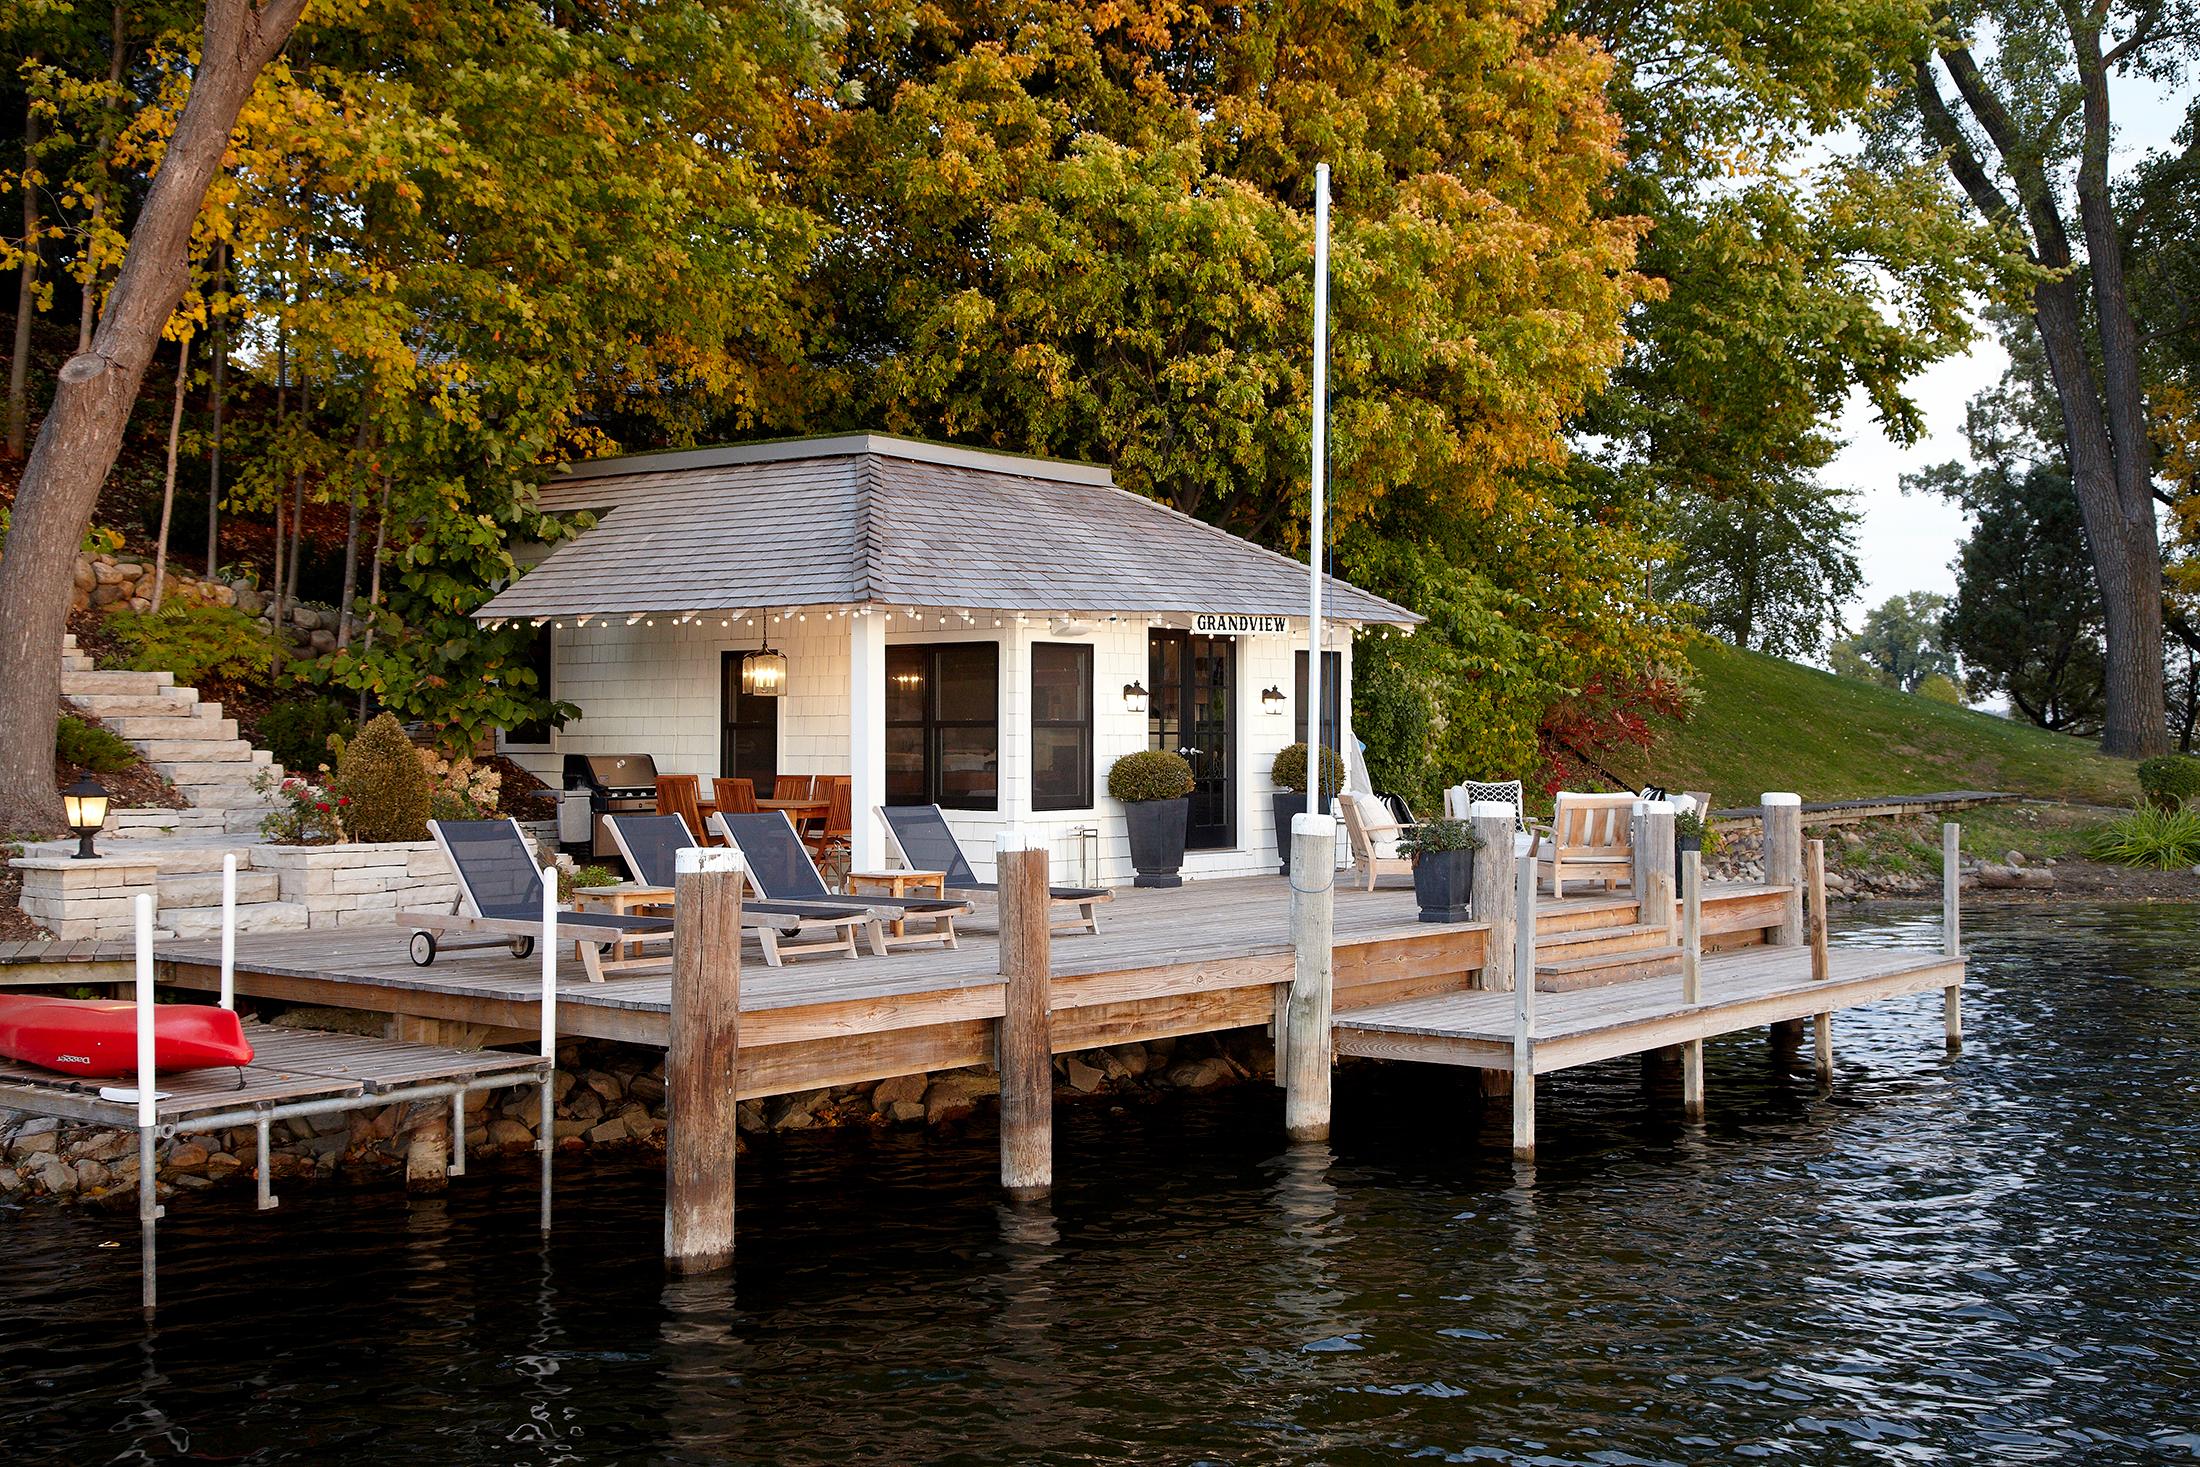 Grandview Boathouse - LAKE MINNETONKA